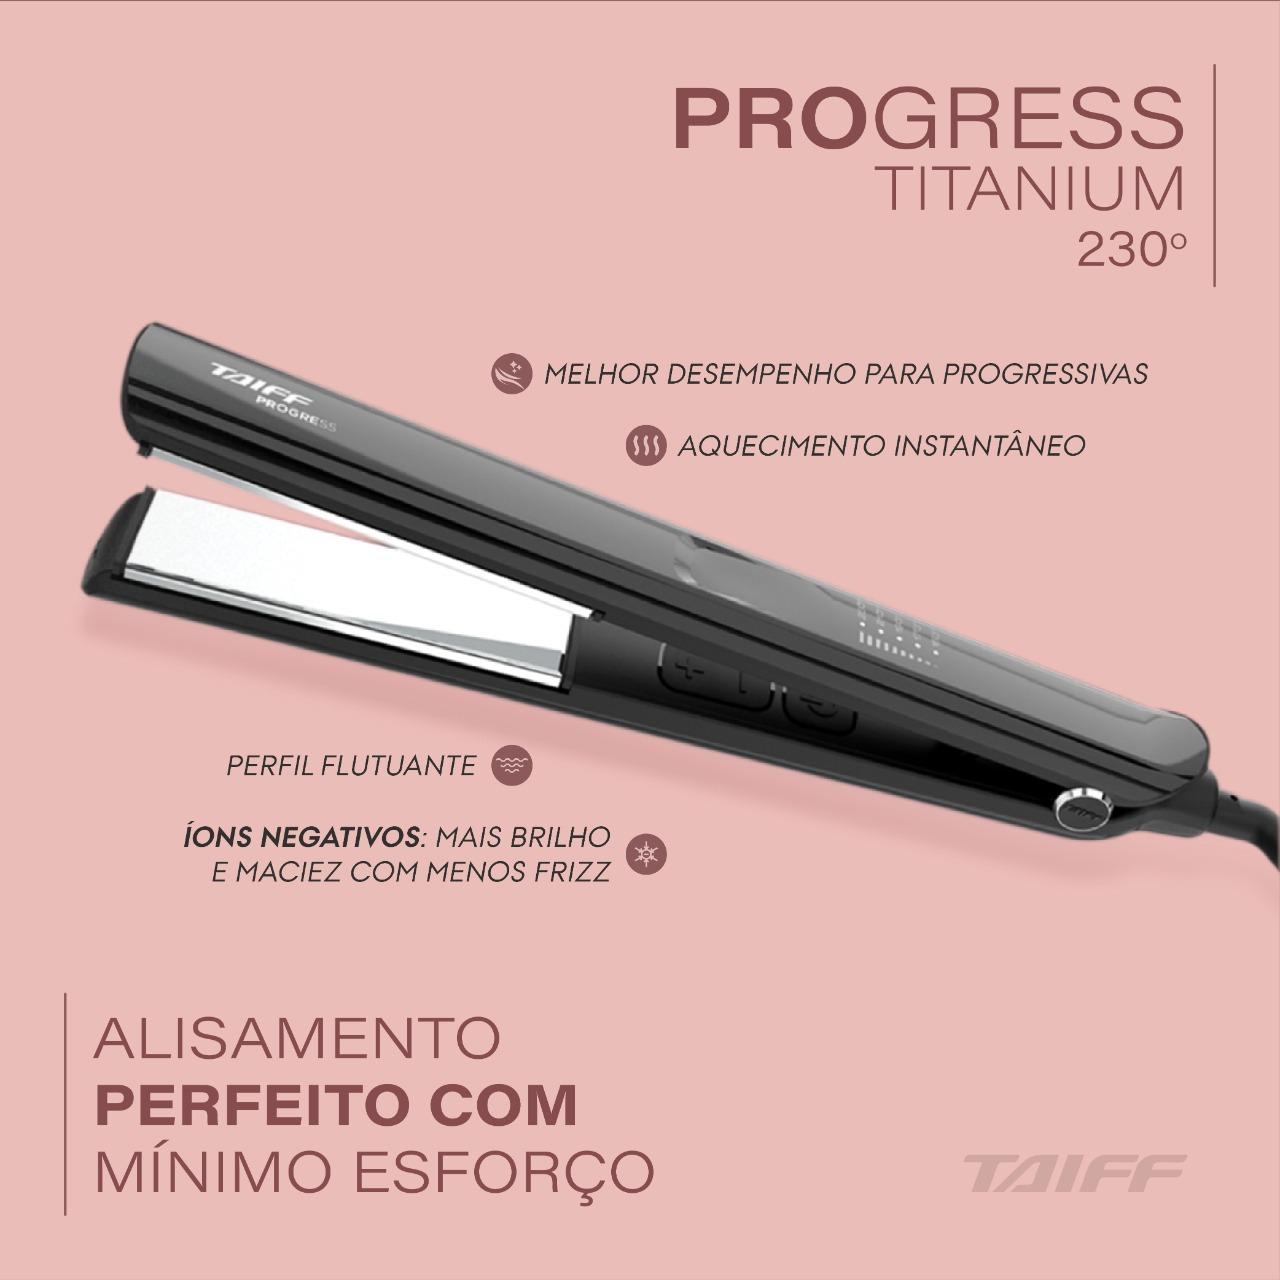 PRANCHA ALISADORA TAIFF PROGRESS TITANIUM 230ºC - BIVOLT